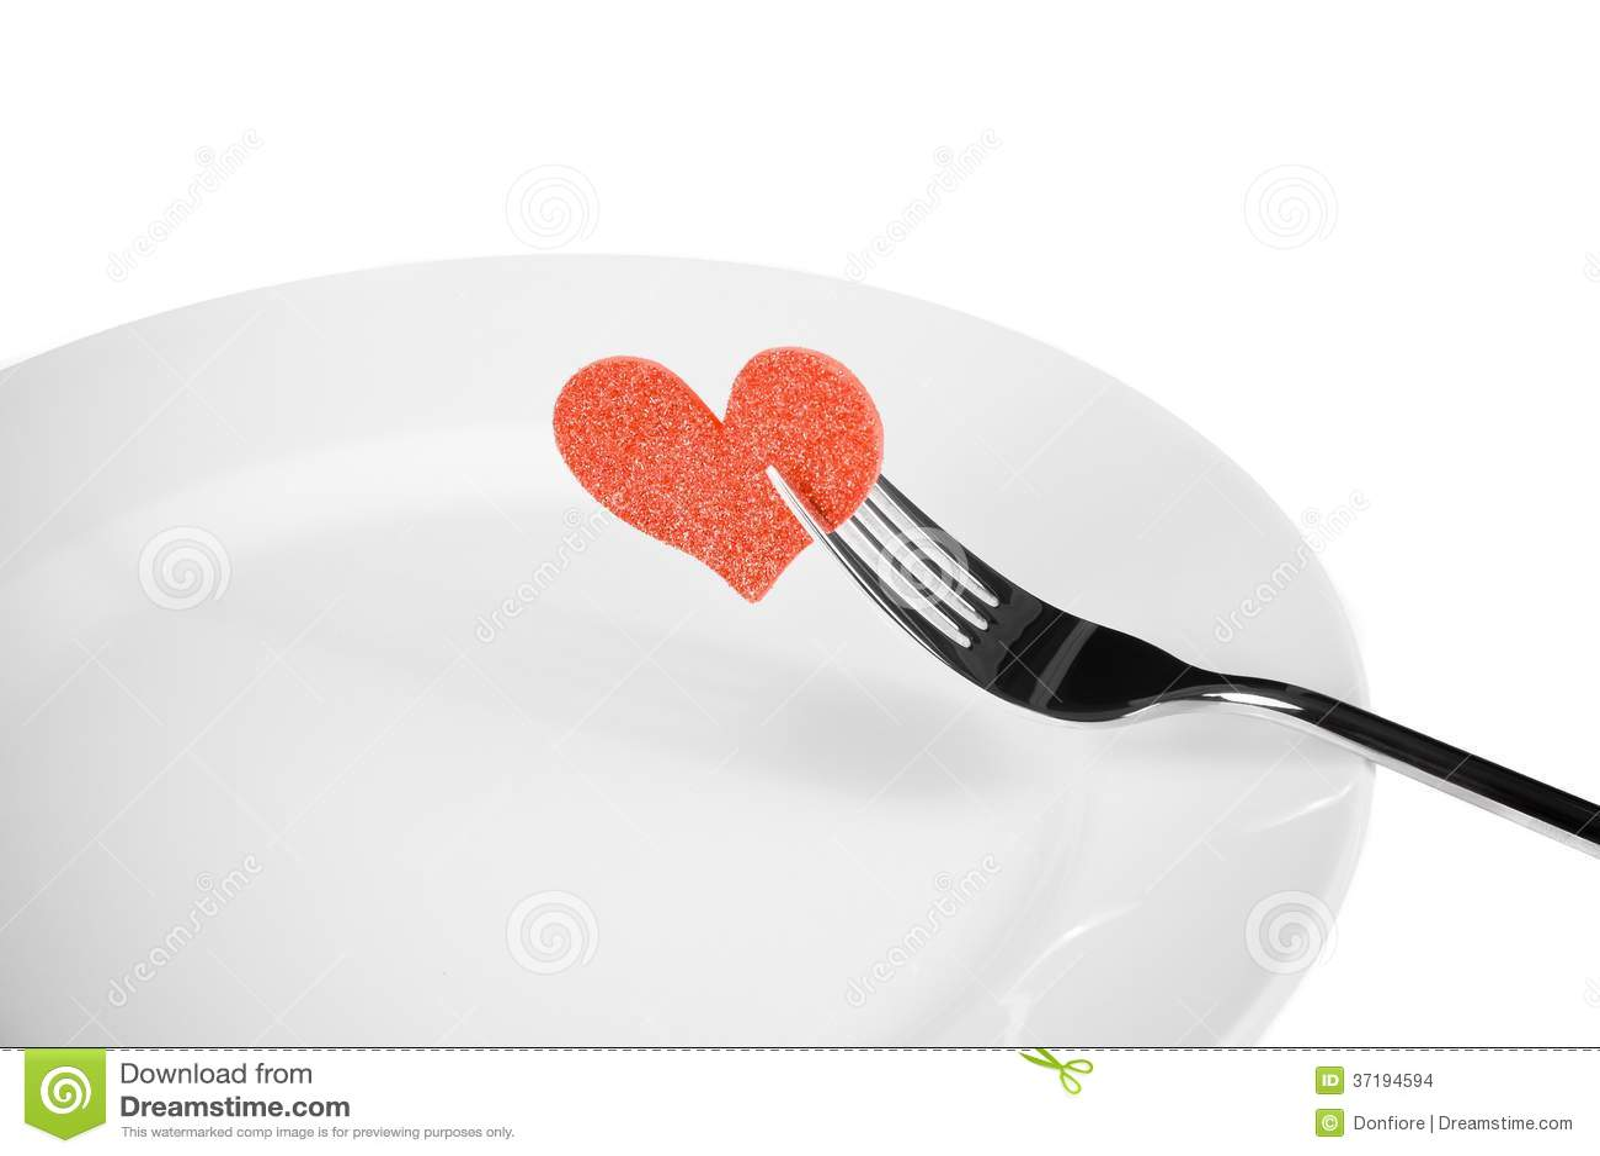 Valentine Day Dinner To Restaurant On White Background Stock Photo